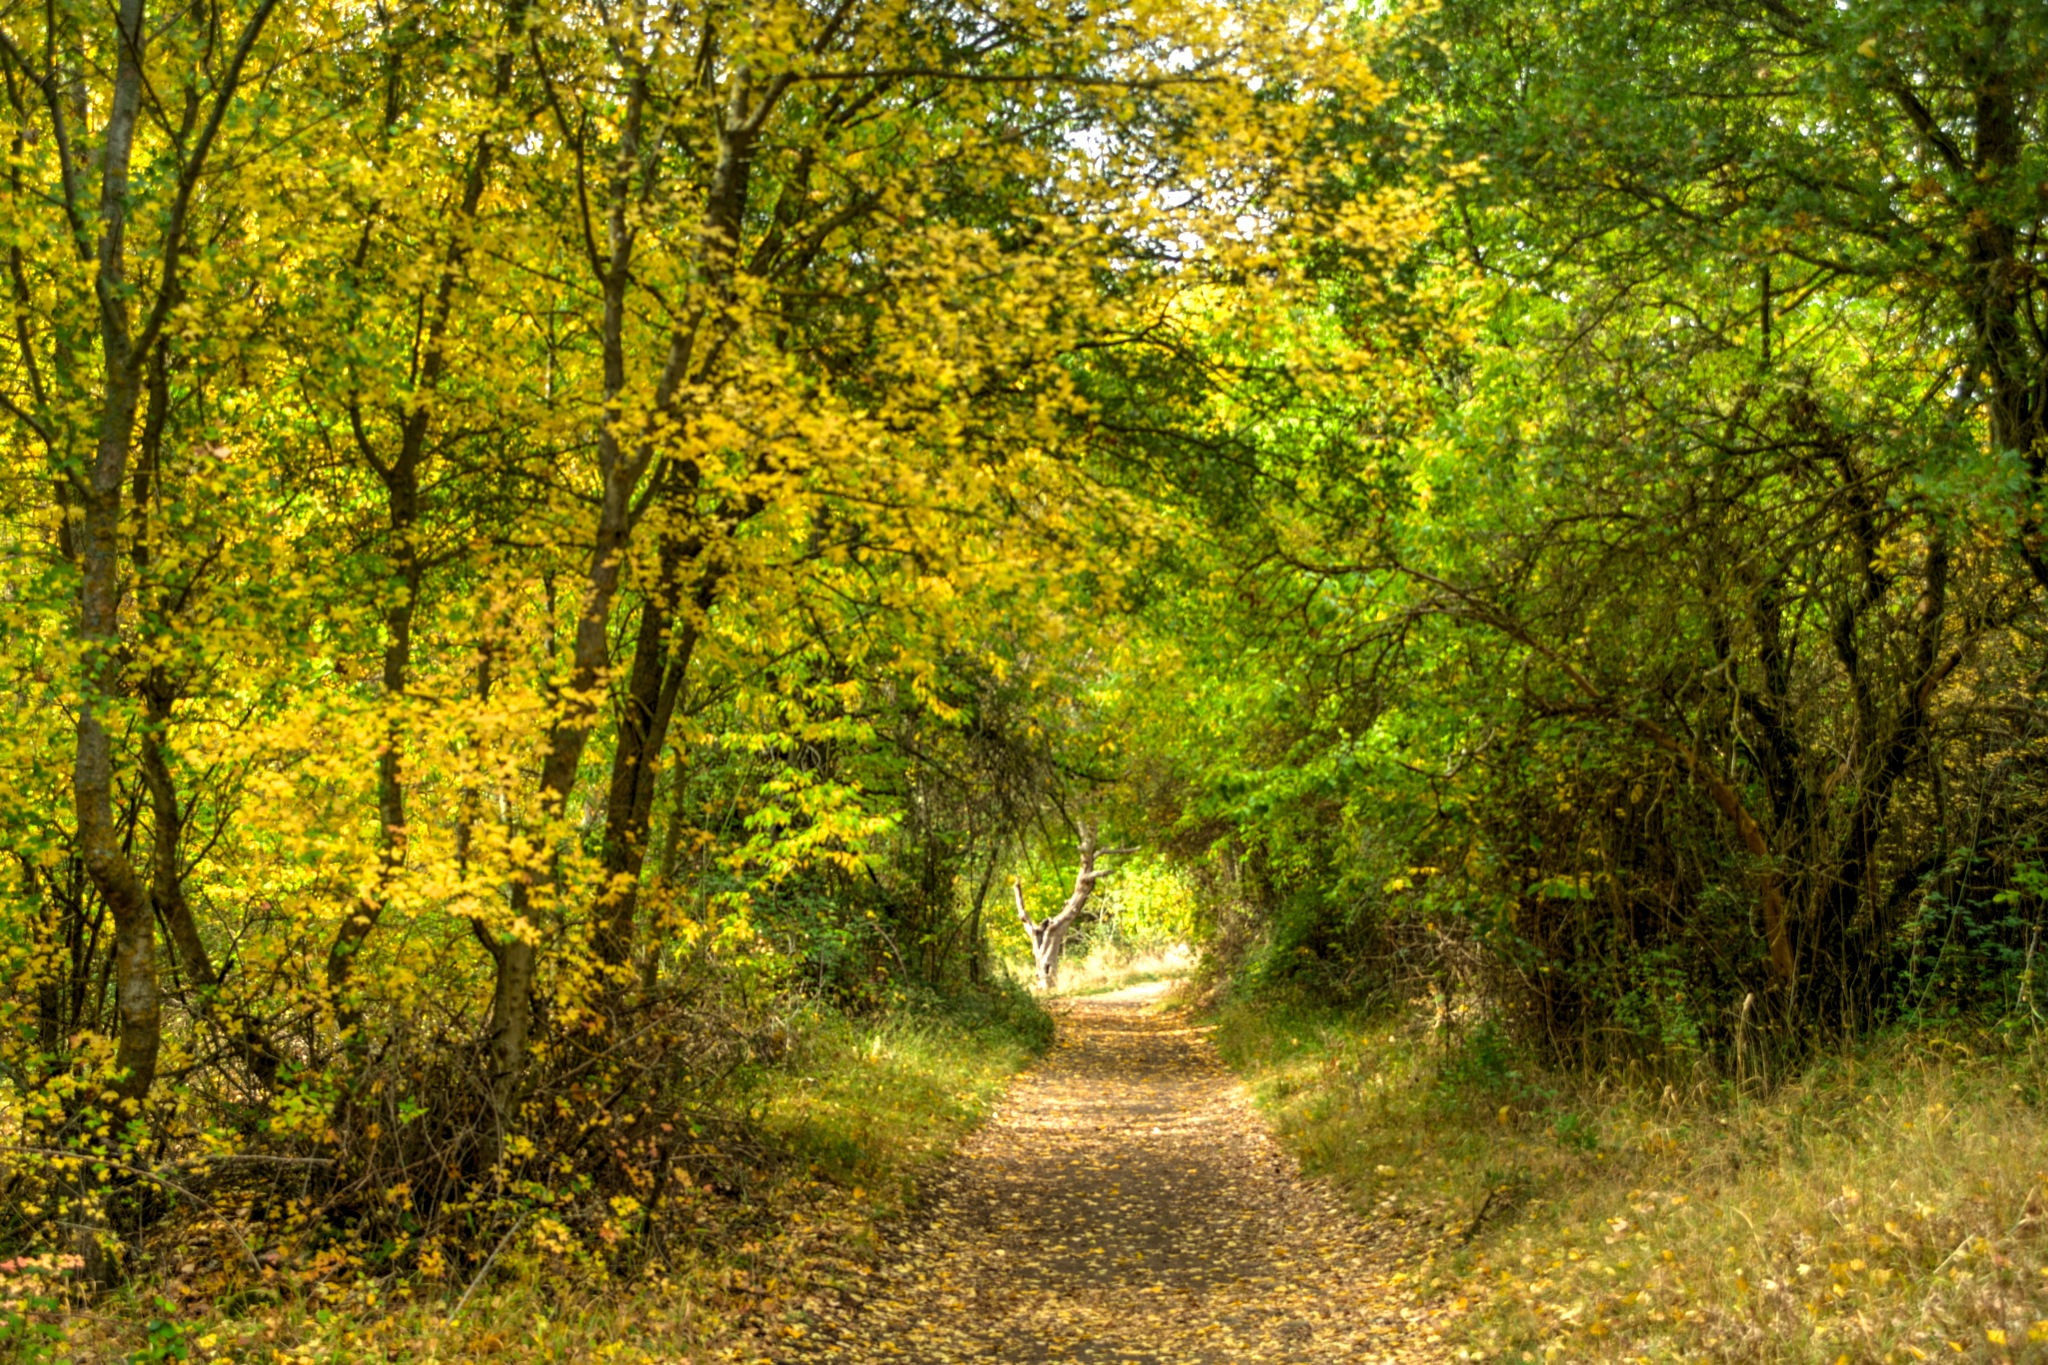 Oyoño 1 by JlmmPhotos